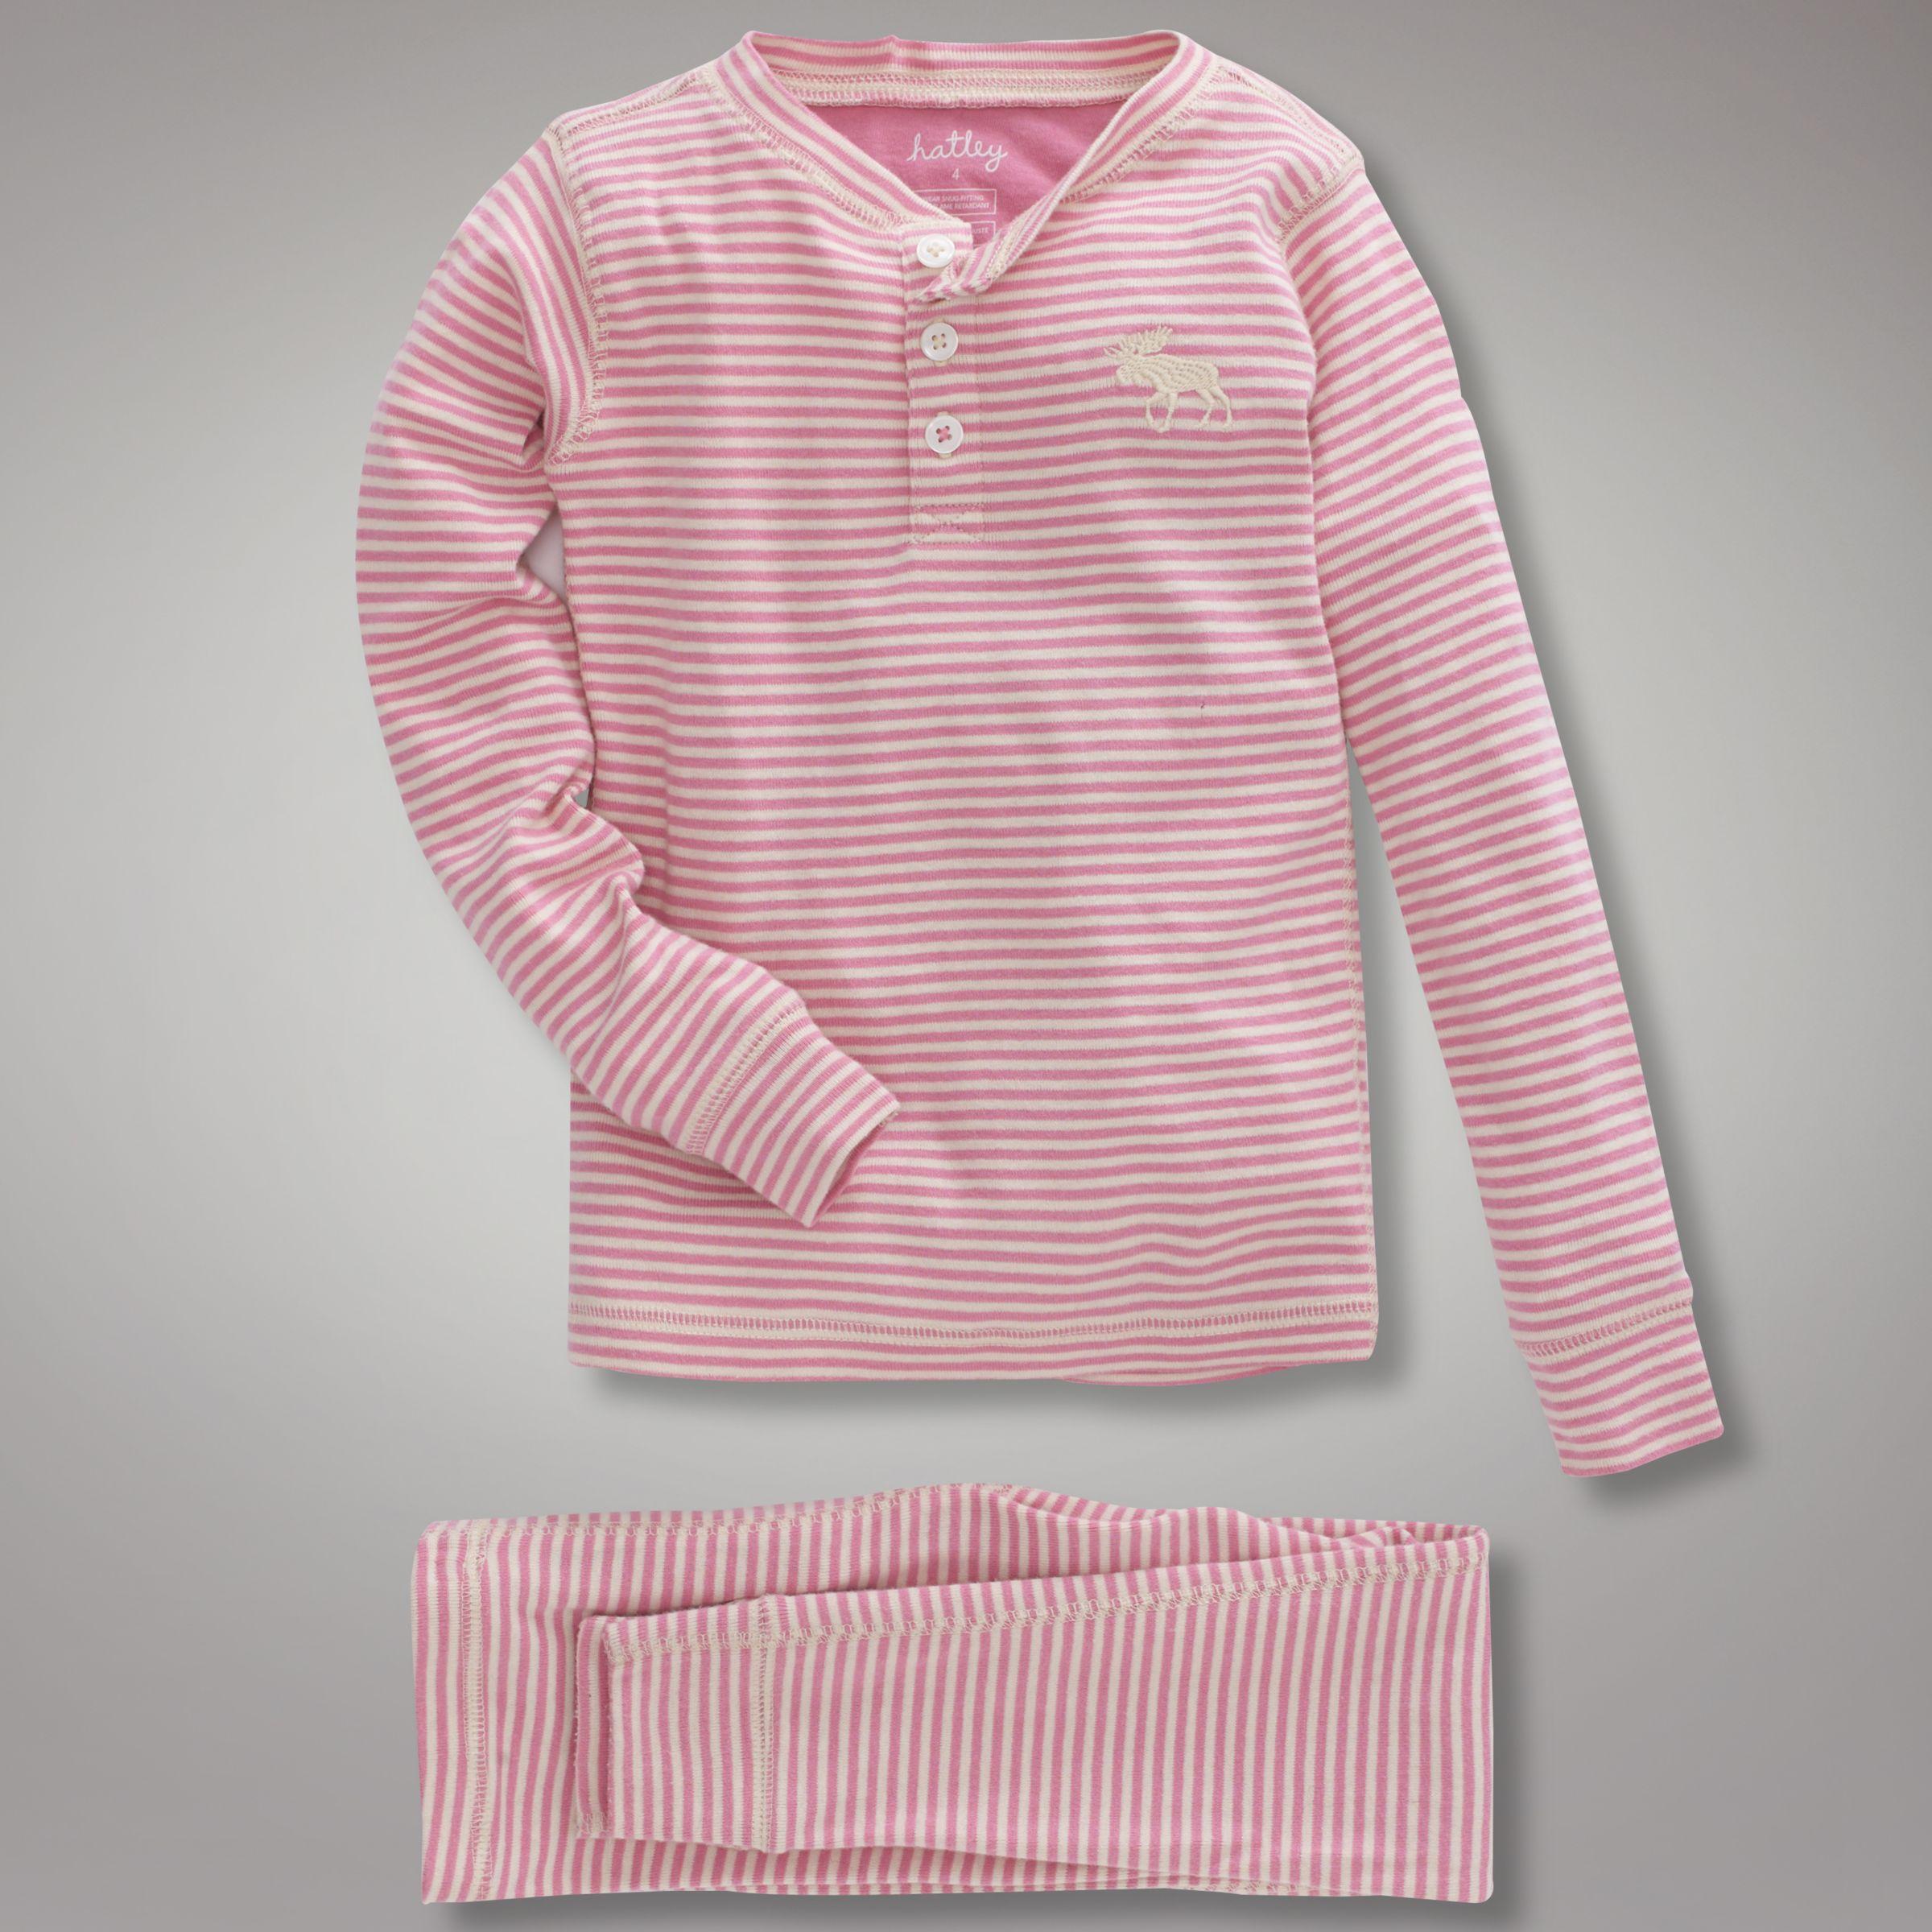 Hatley Moose Stripe Pyjamas, Pink